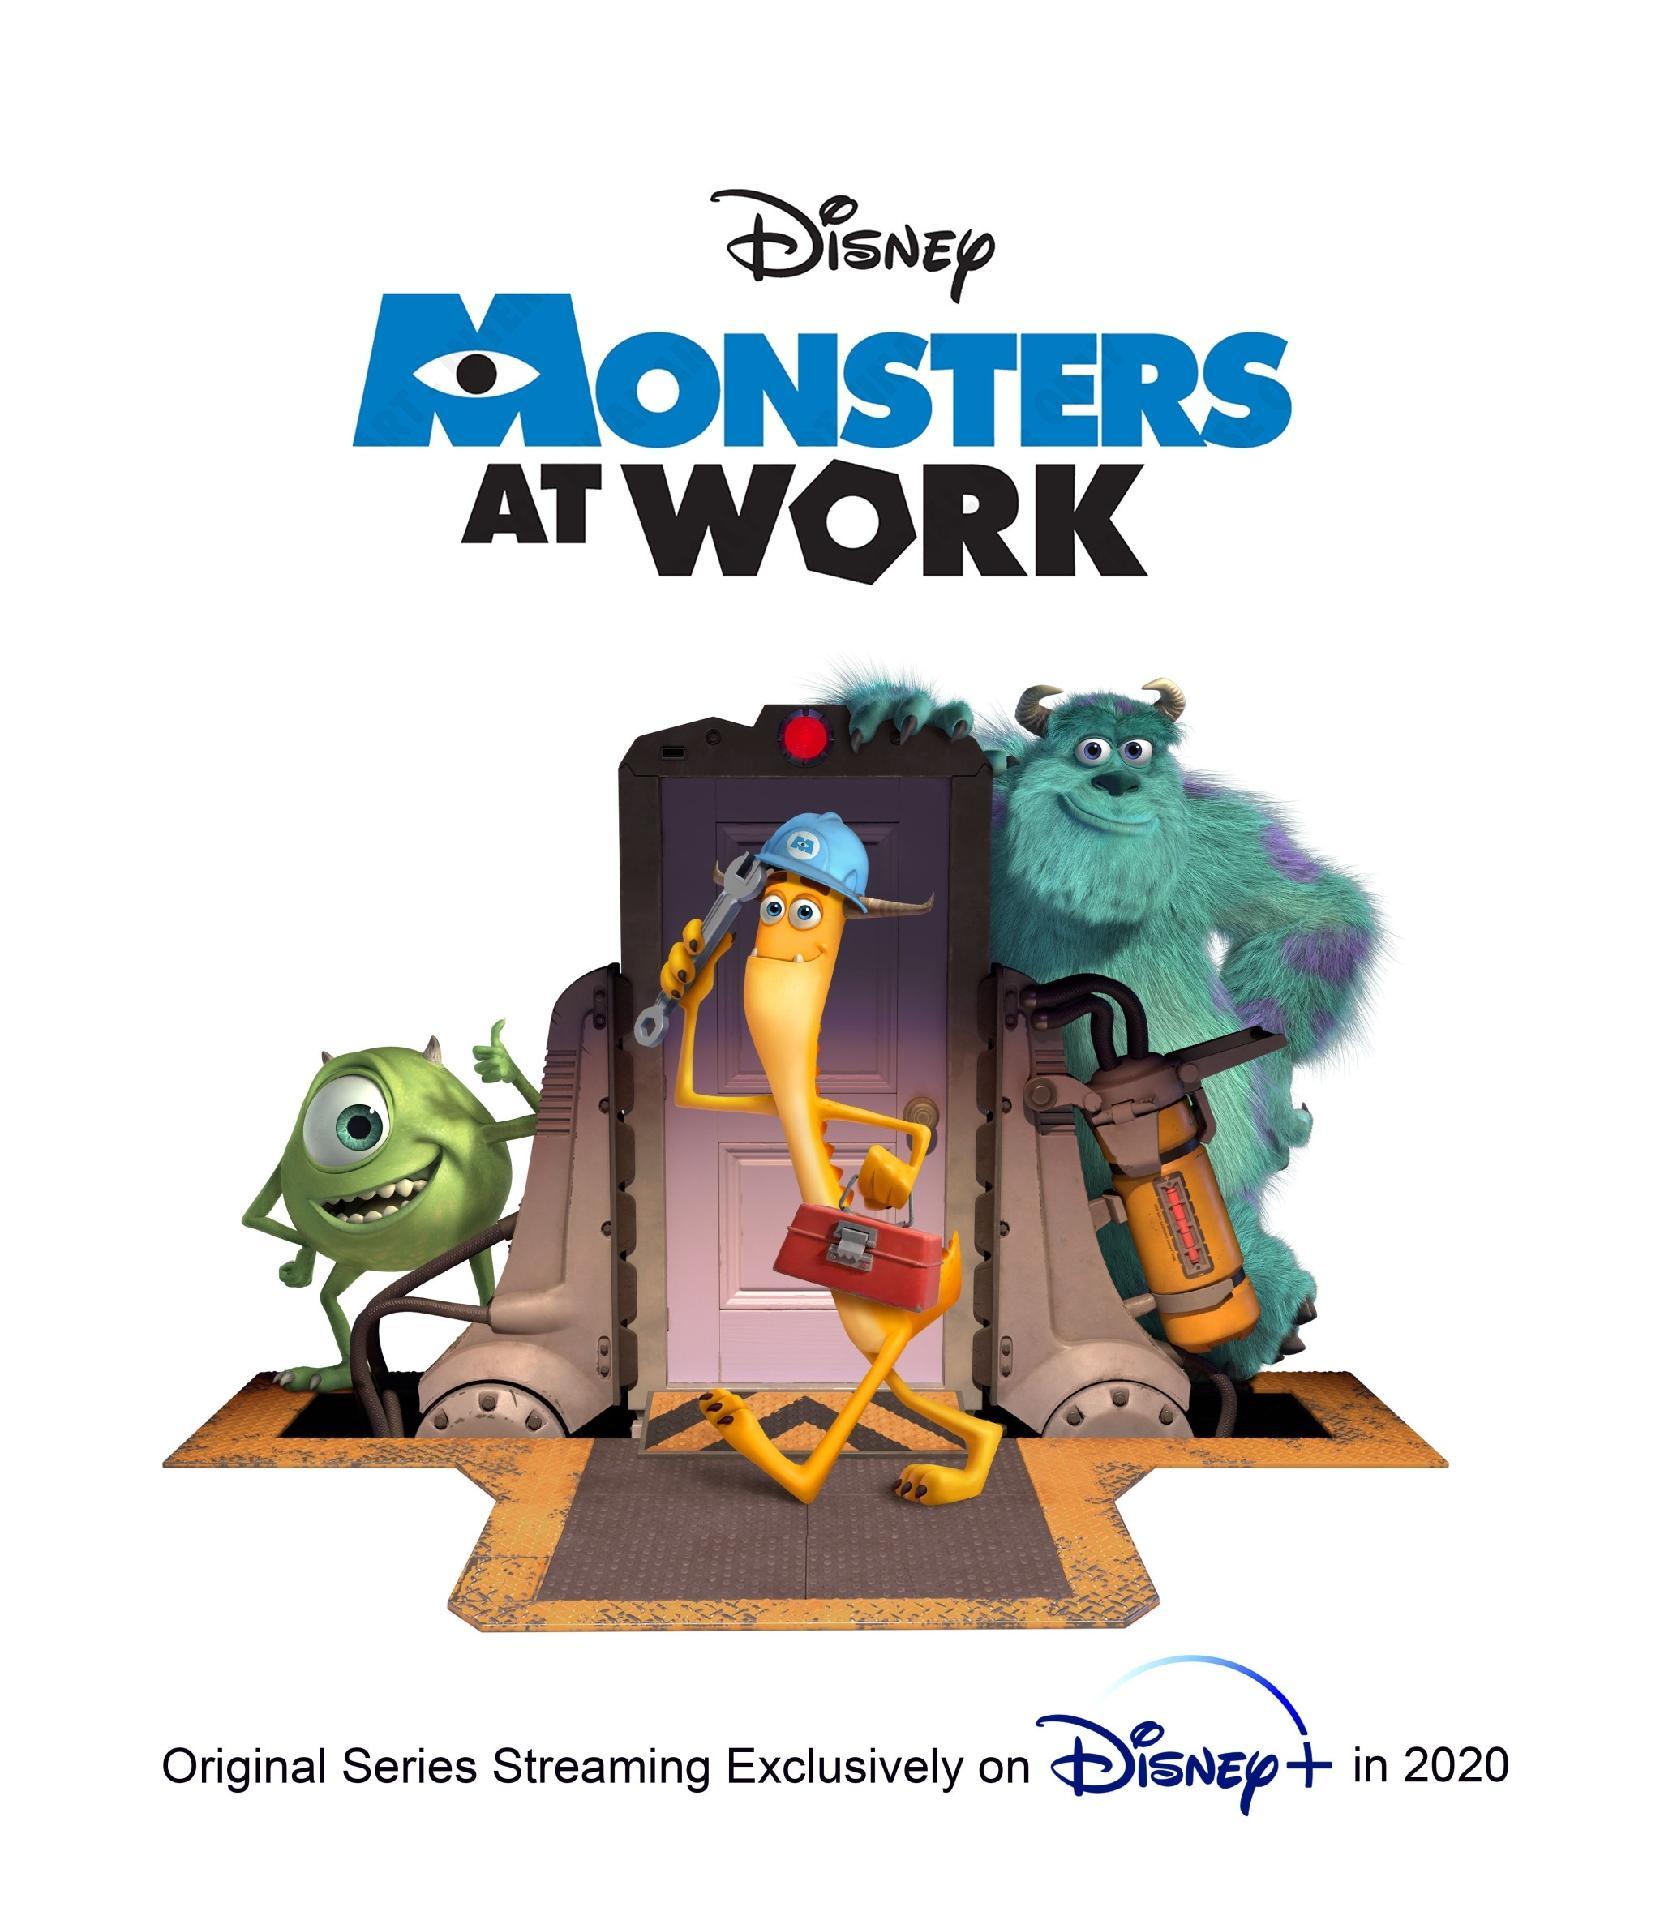 Monsters at Work | Disney + divulga teaser da série spin-off de Monstros S.A.